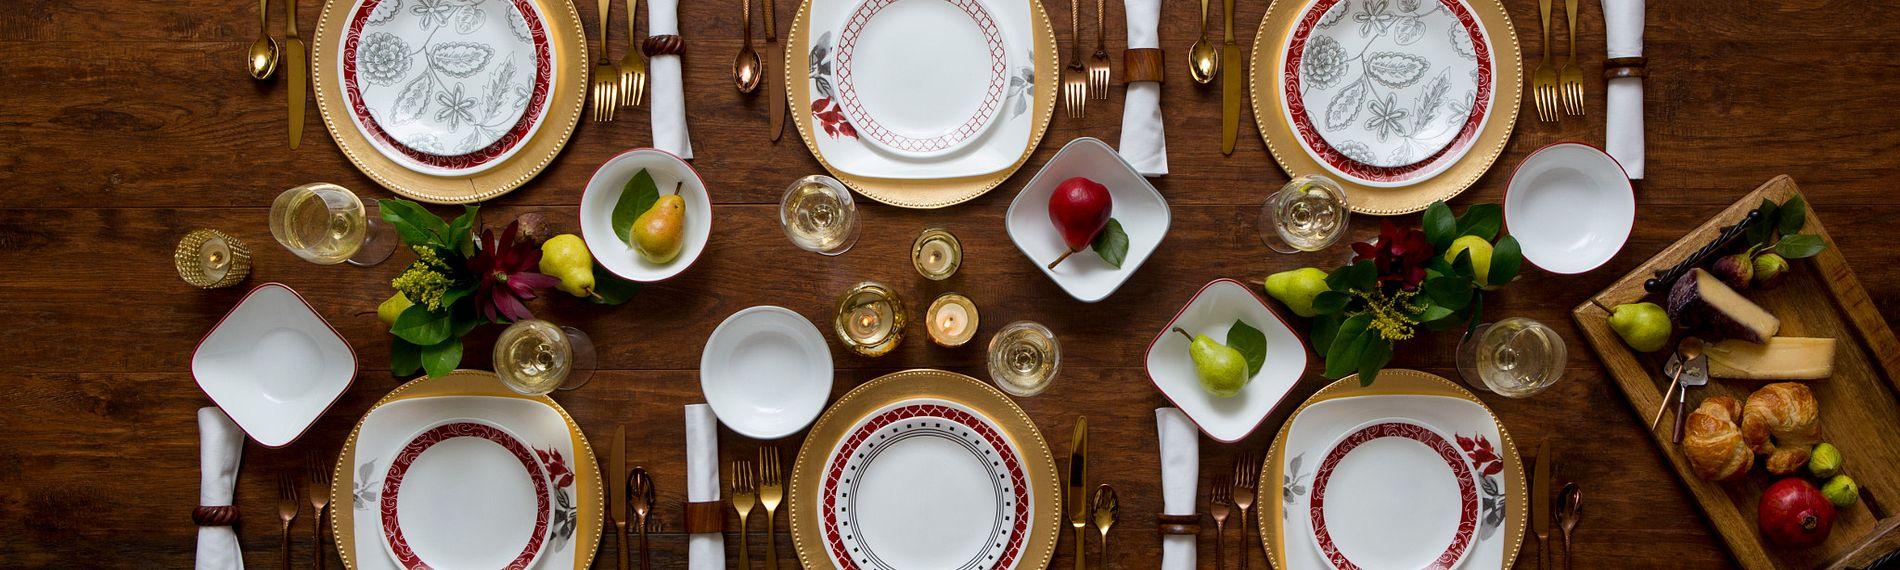 cor_holiday_table_splendor_city_block_kyoto_leaves_crimson_trellis_bandhani_1